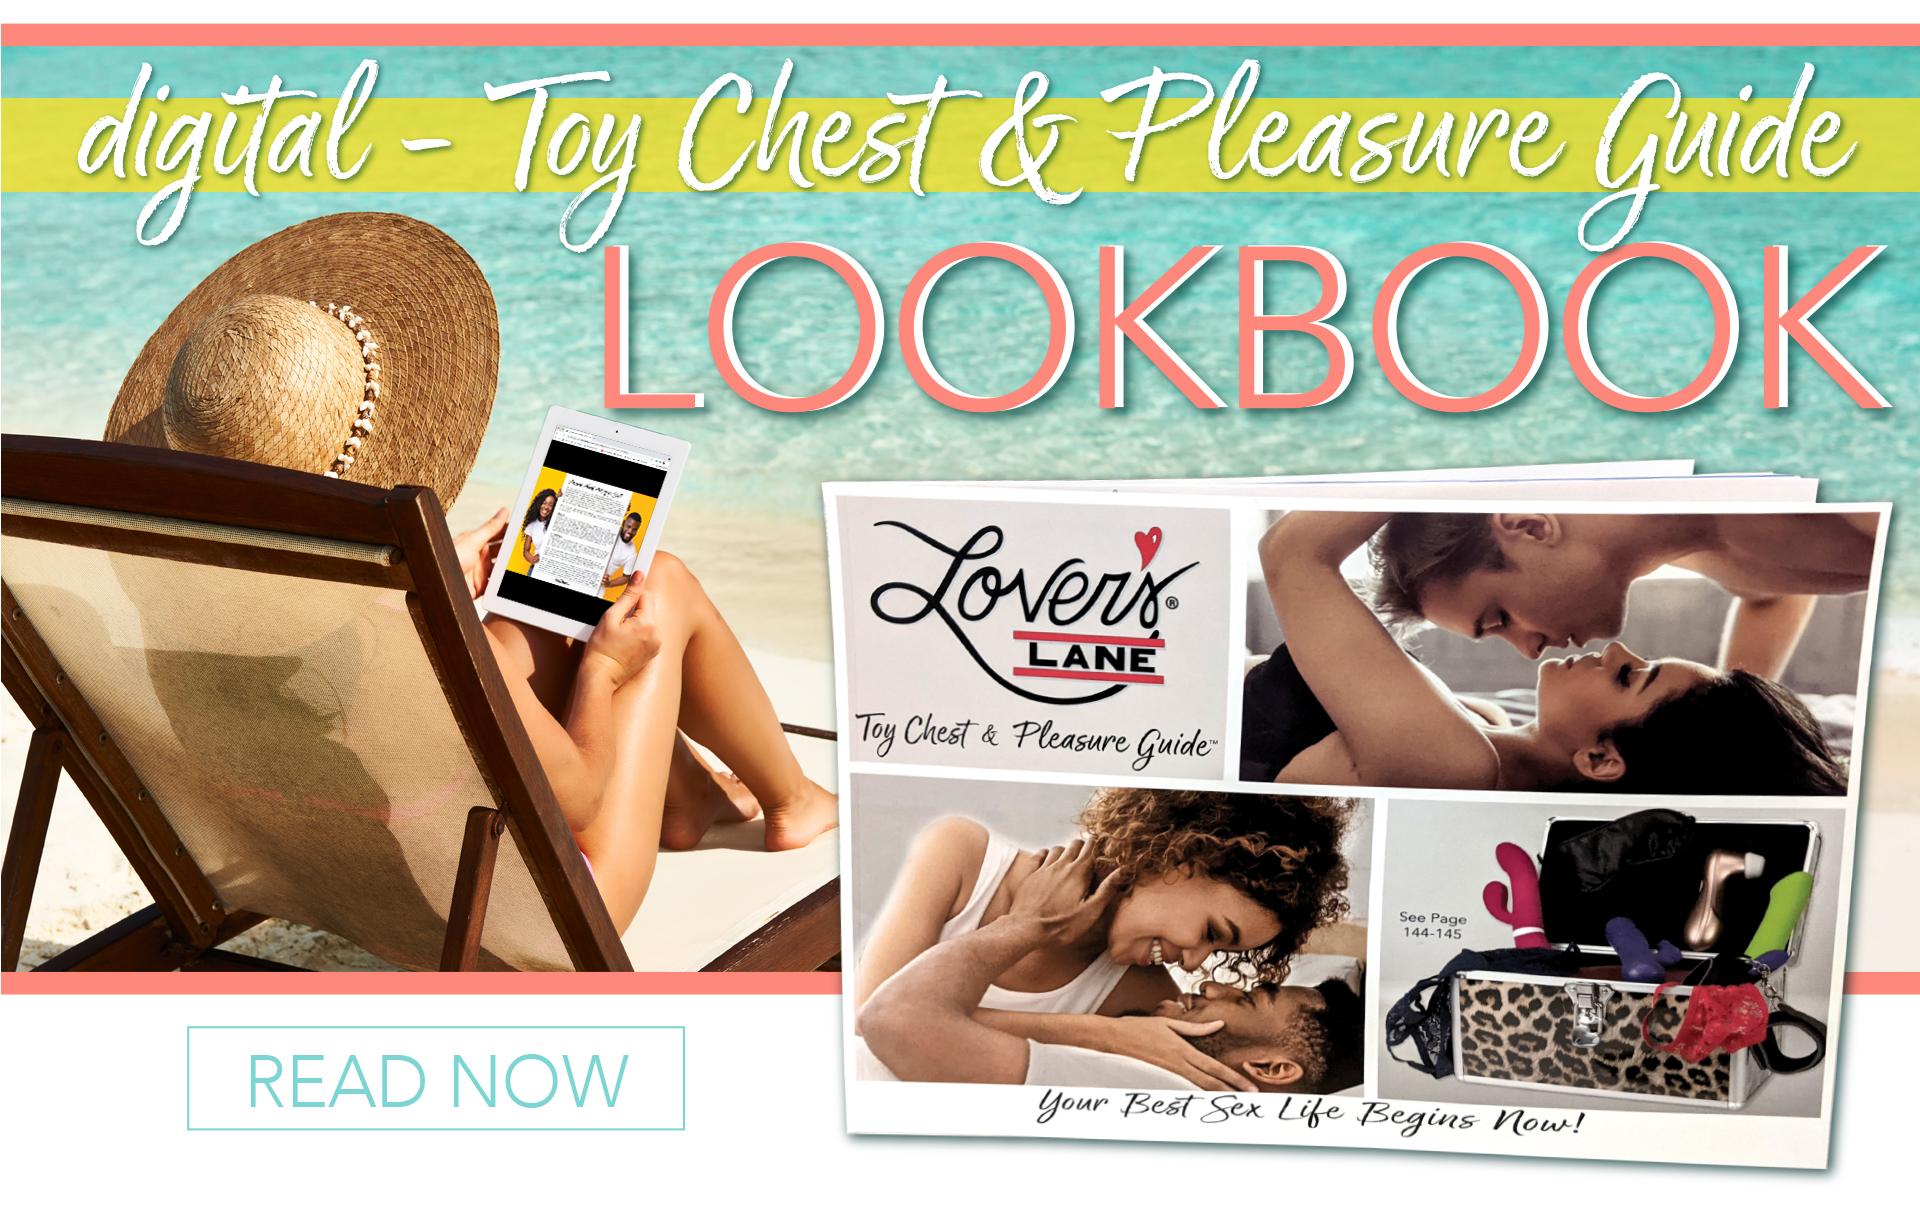 Digital Toy Chest & Pleasure Guide LOOKBOOK - READ NOW